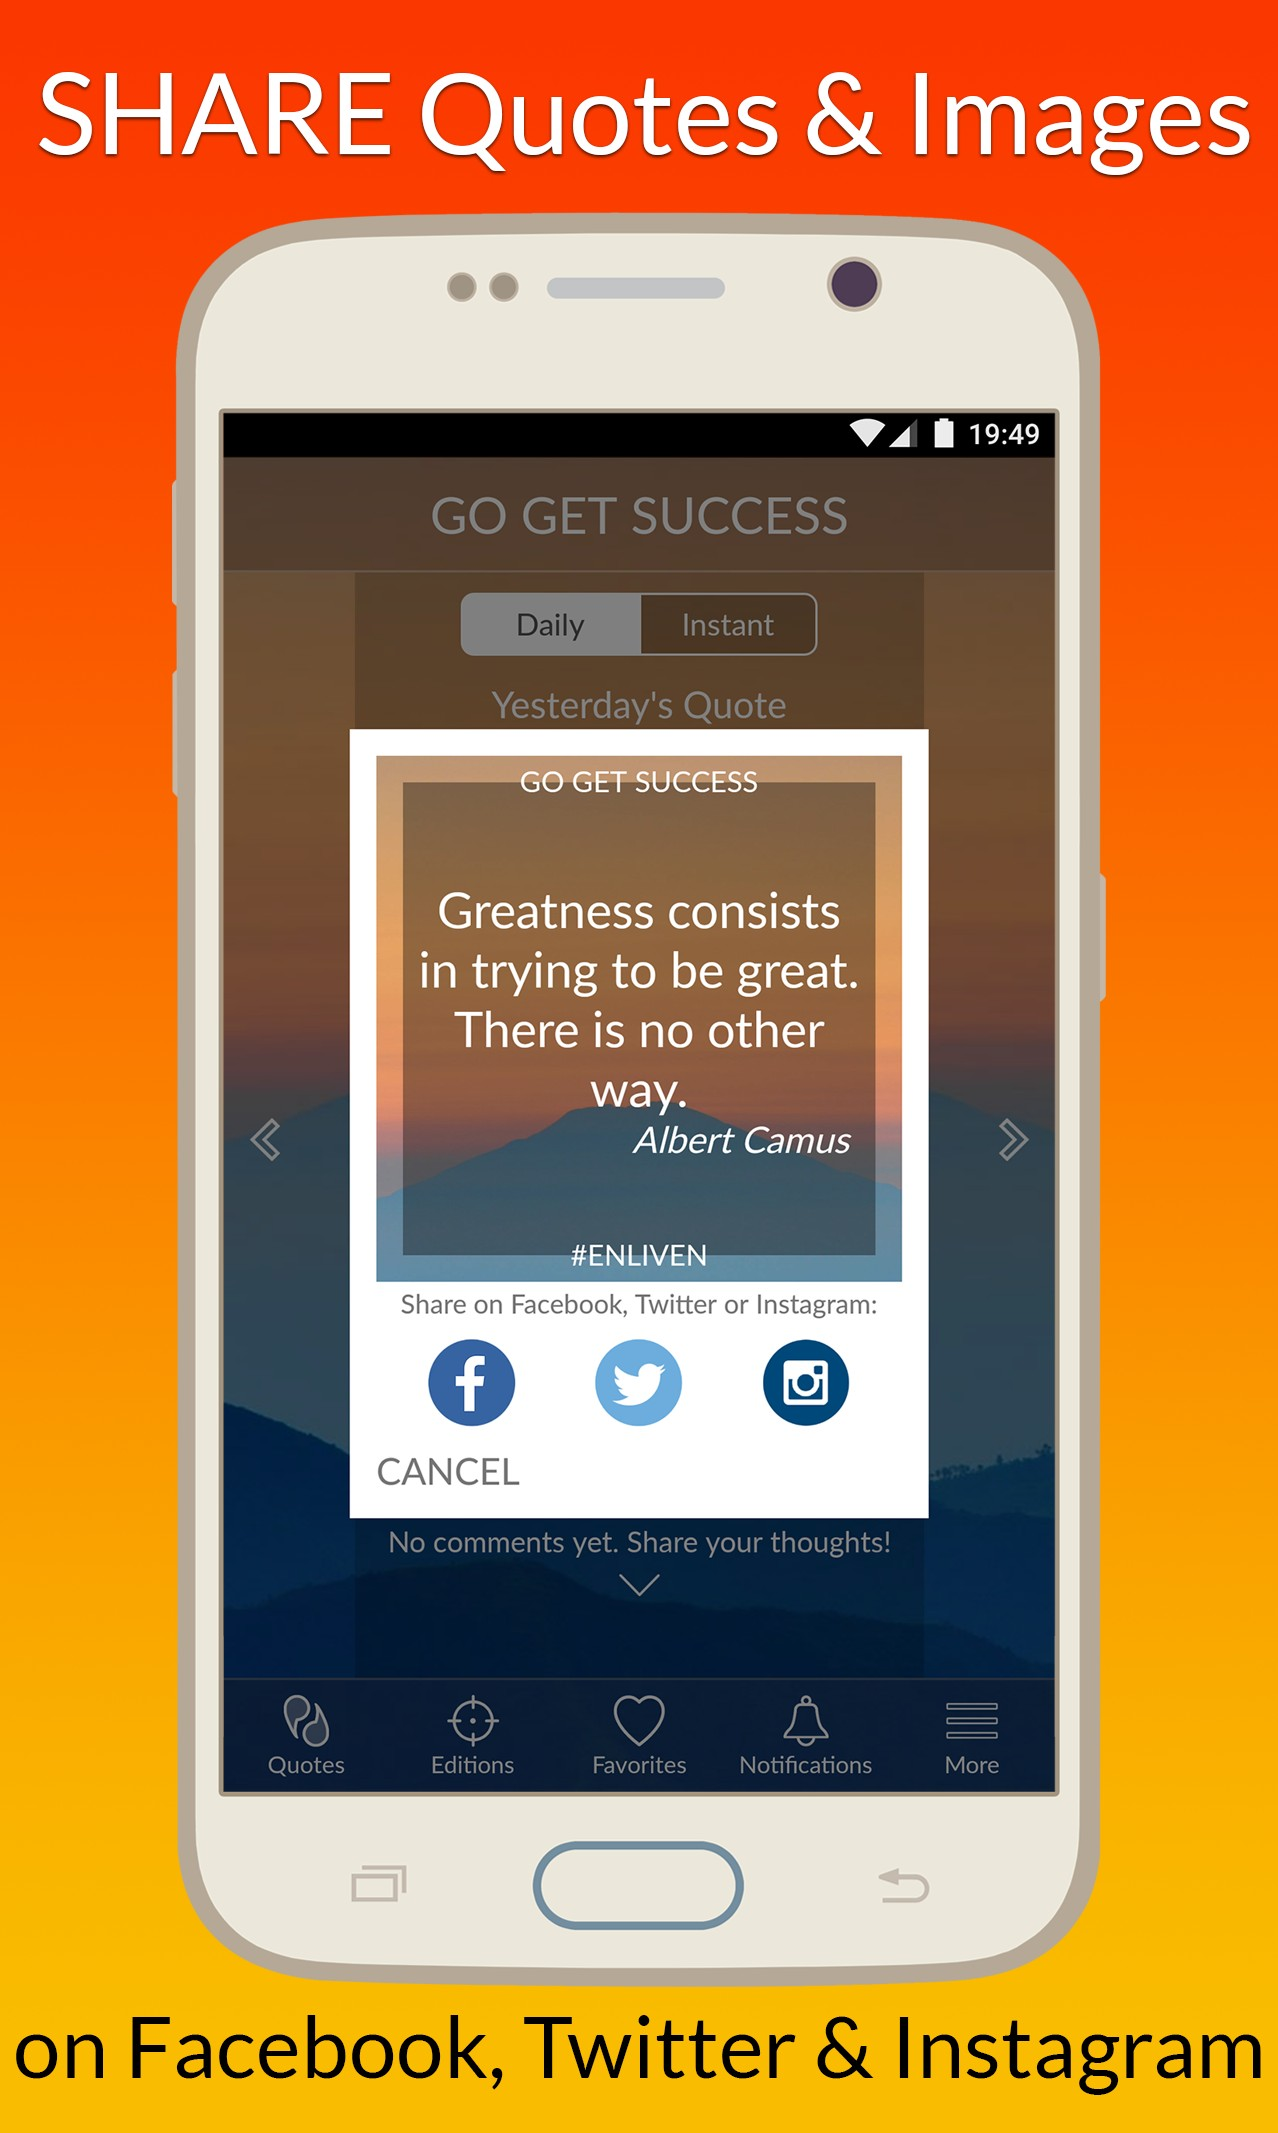 100 Best Design Quotes Yet Lessons for Graphic Designers  |App Design Quotes